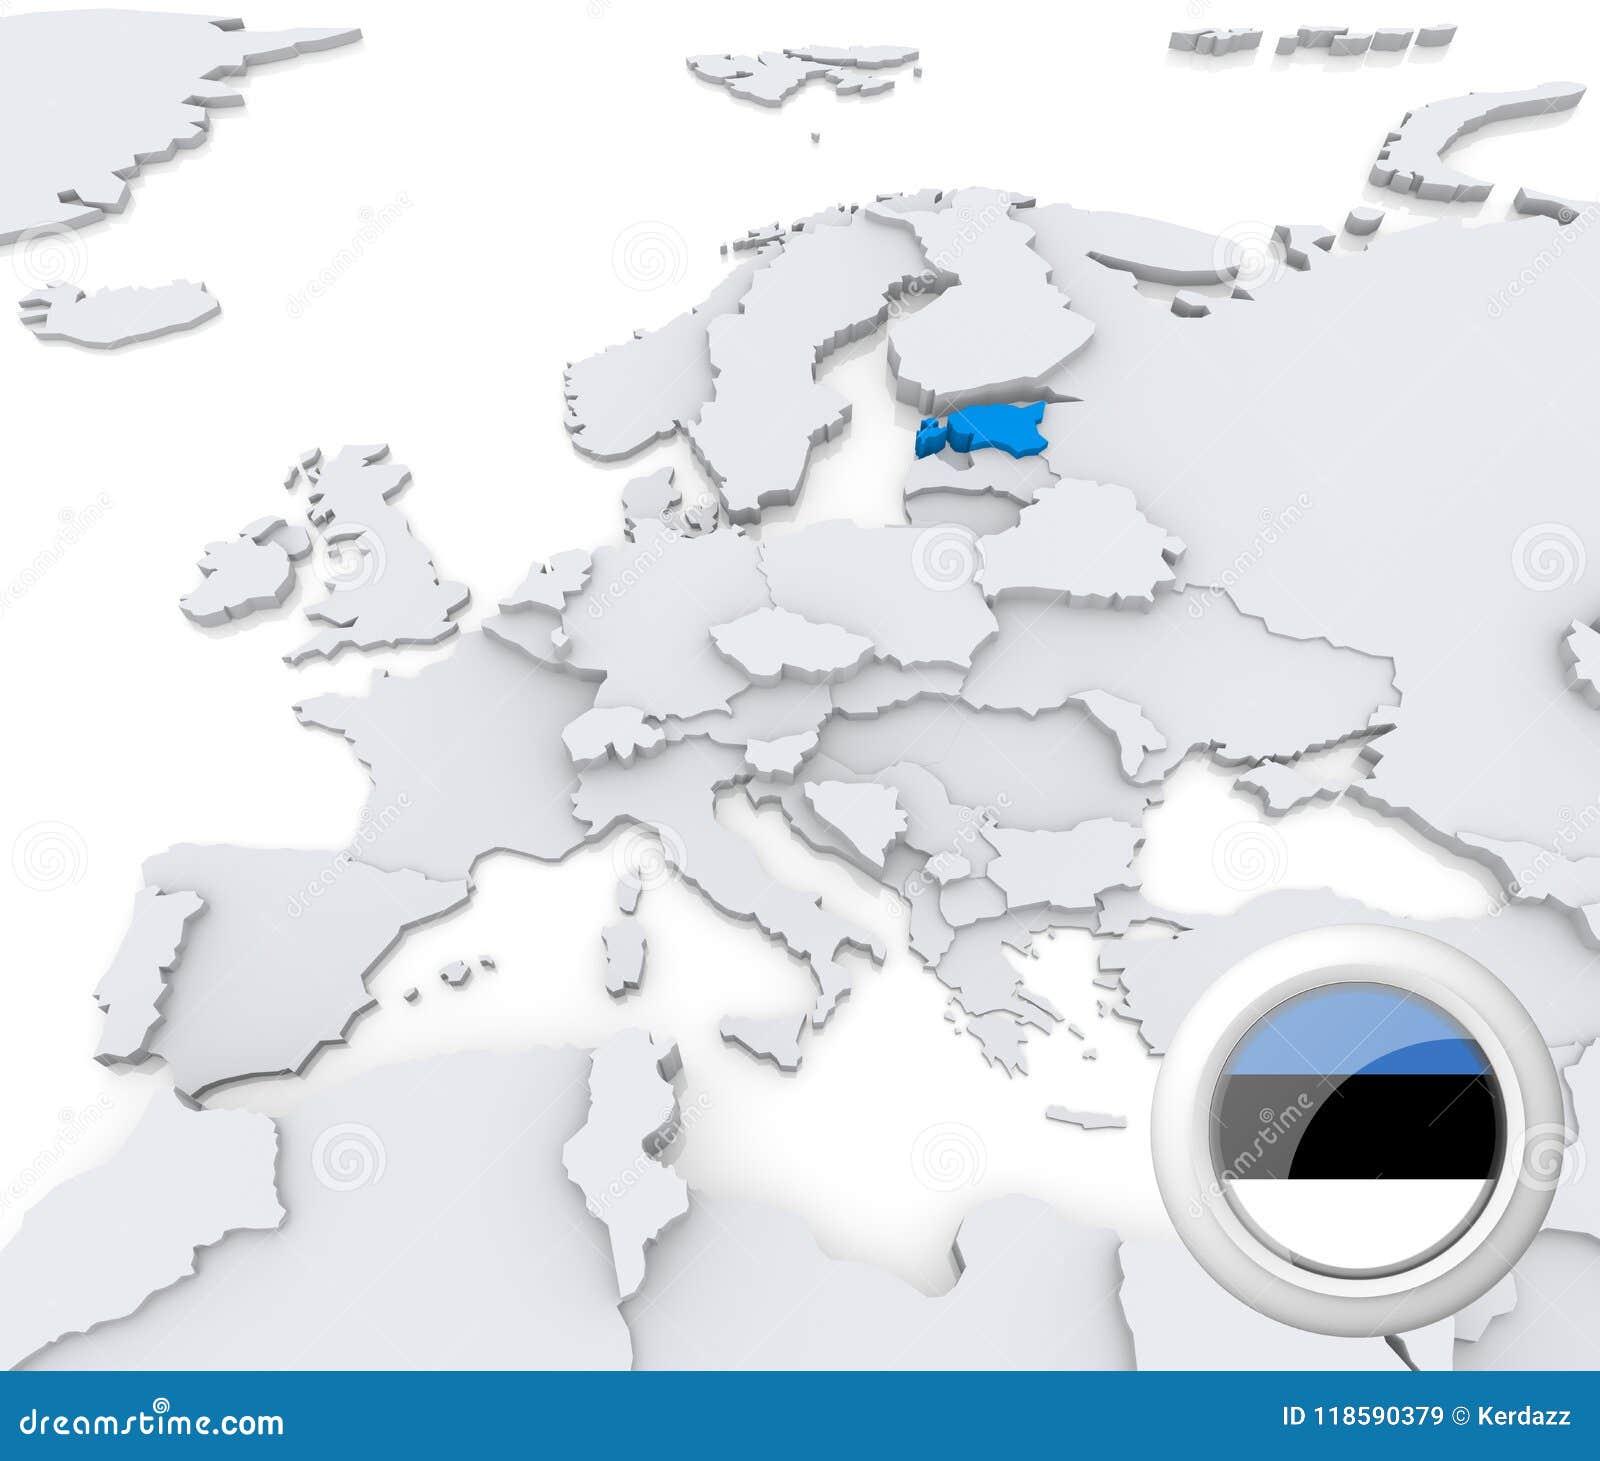 Map Of Europe Georgia.Estonia On Map Of Europe Stock Illustration Illustration Of Georgia